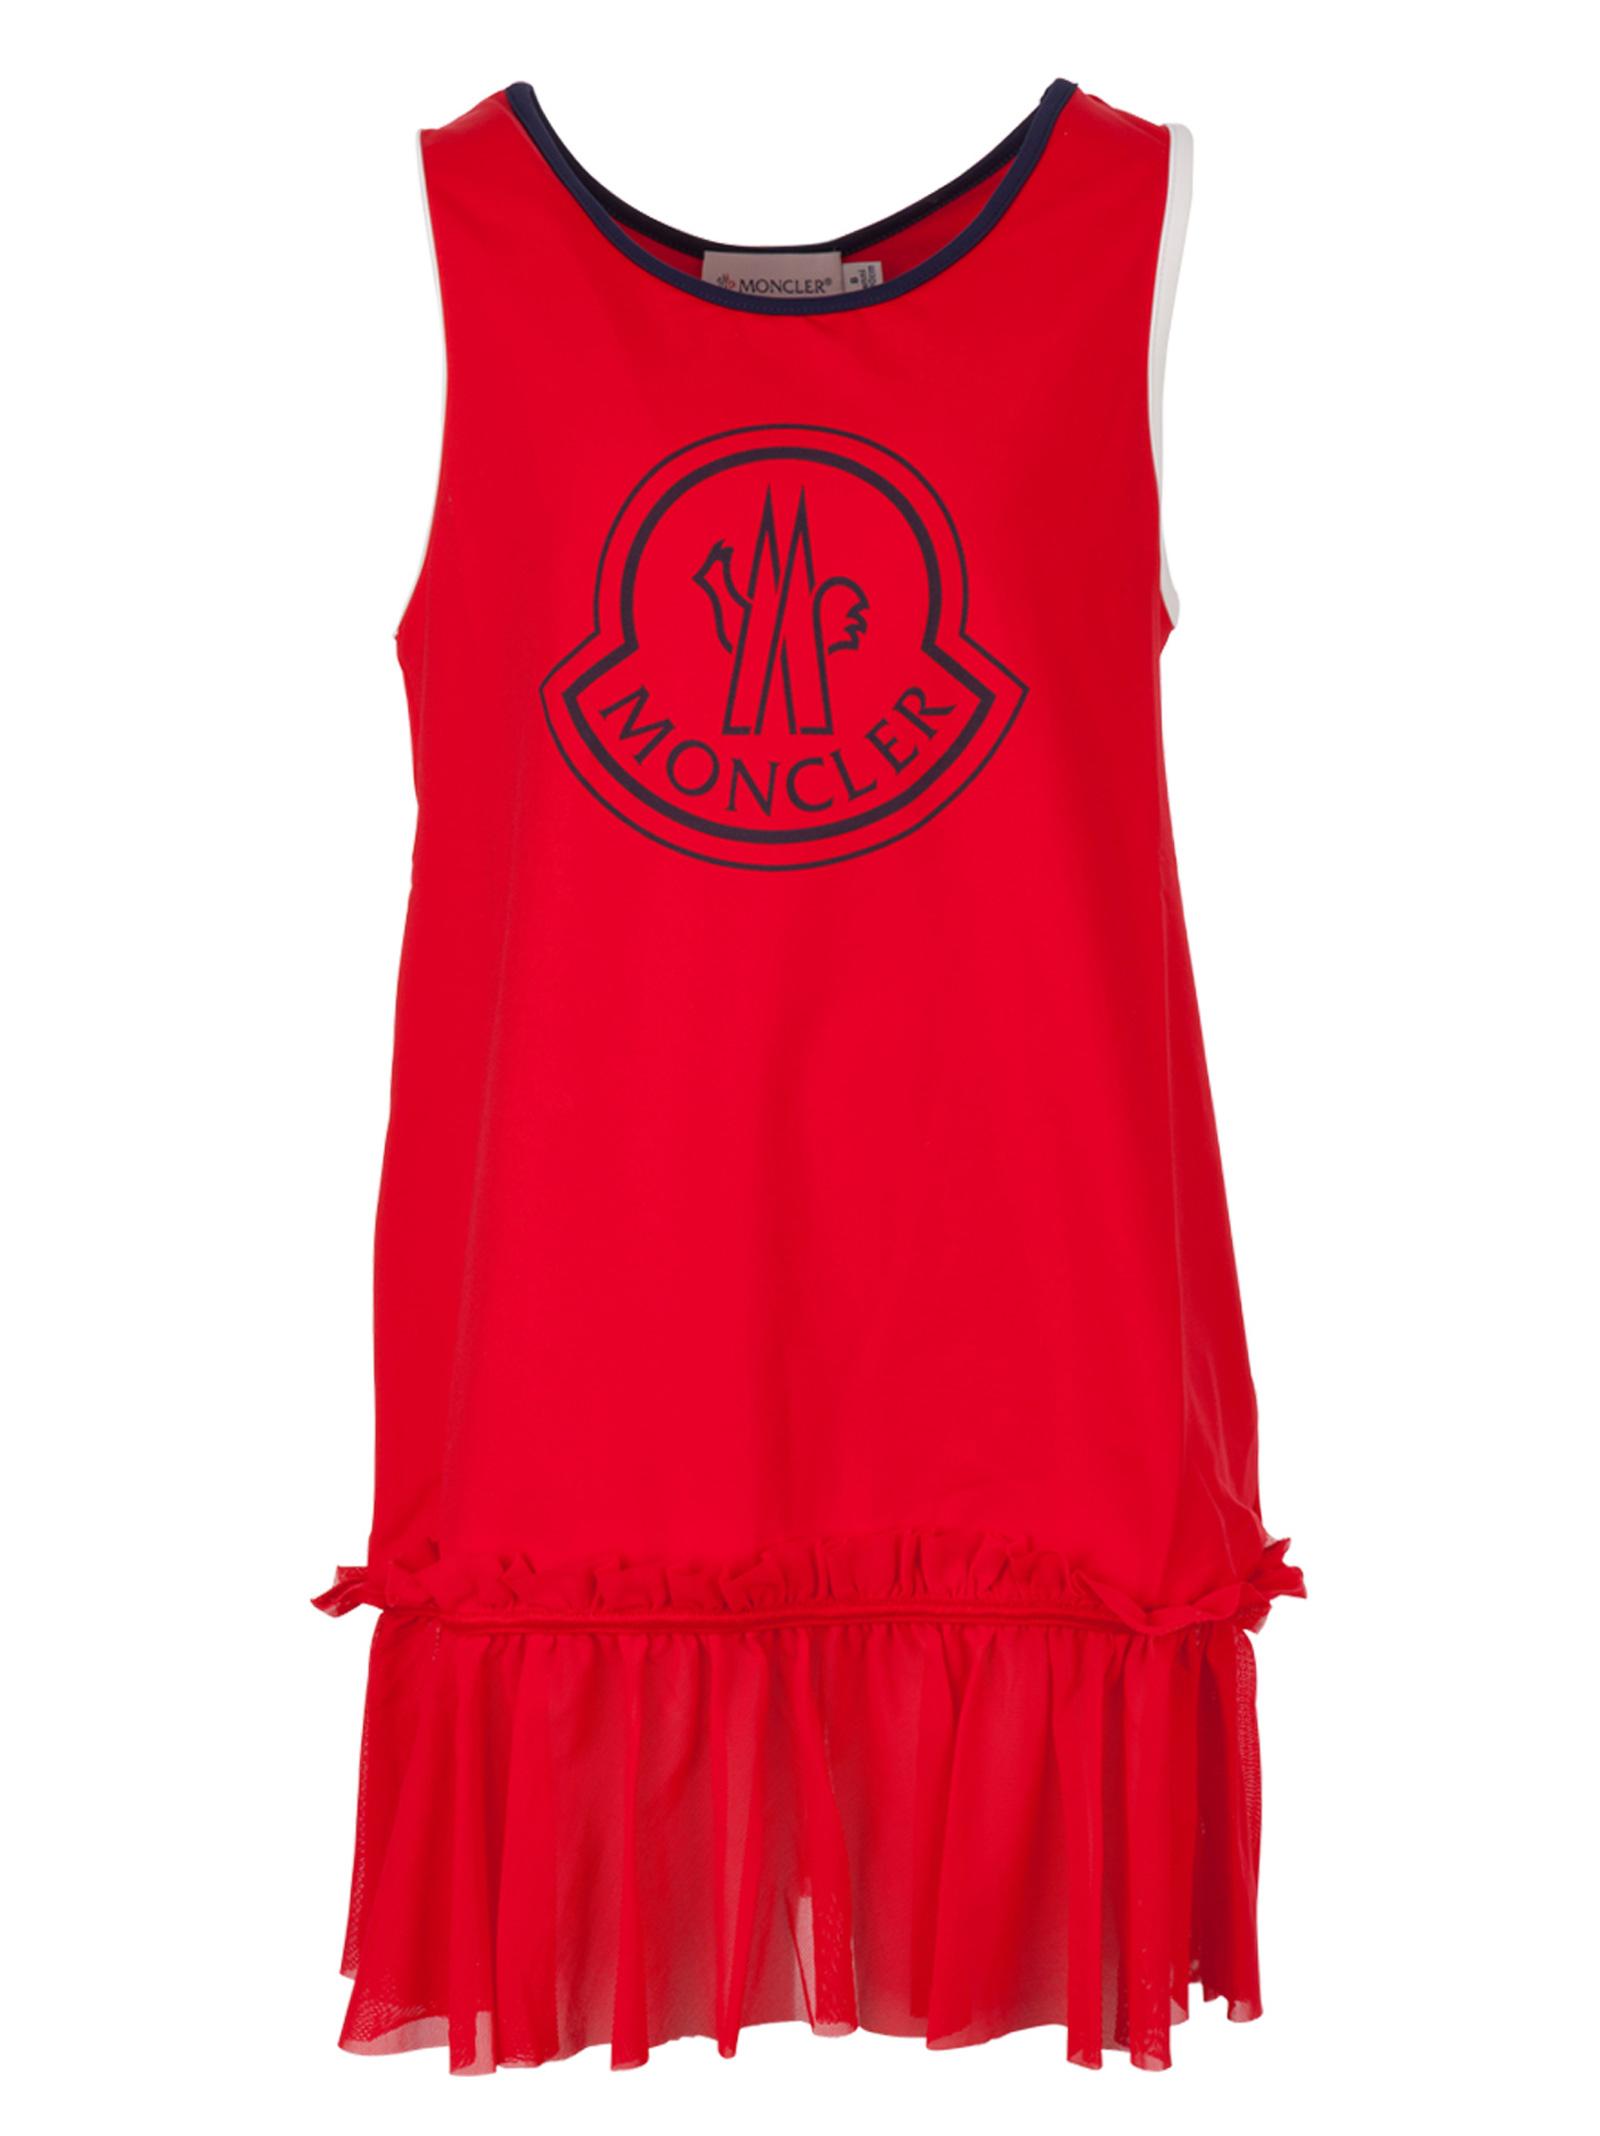 89273f60f Moncler Kids dress - Moncler Enfant - Michele Franzese Moda